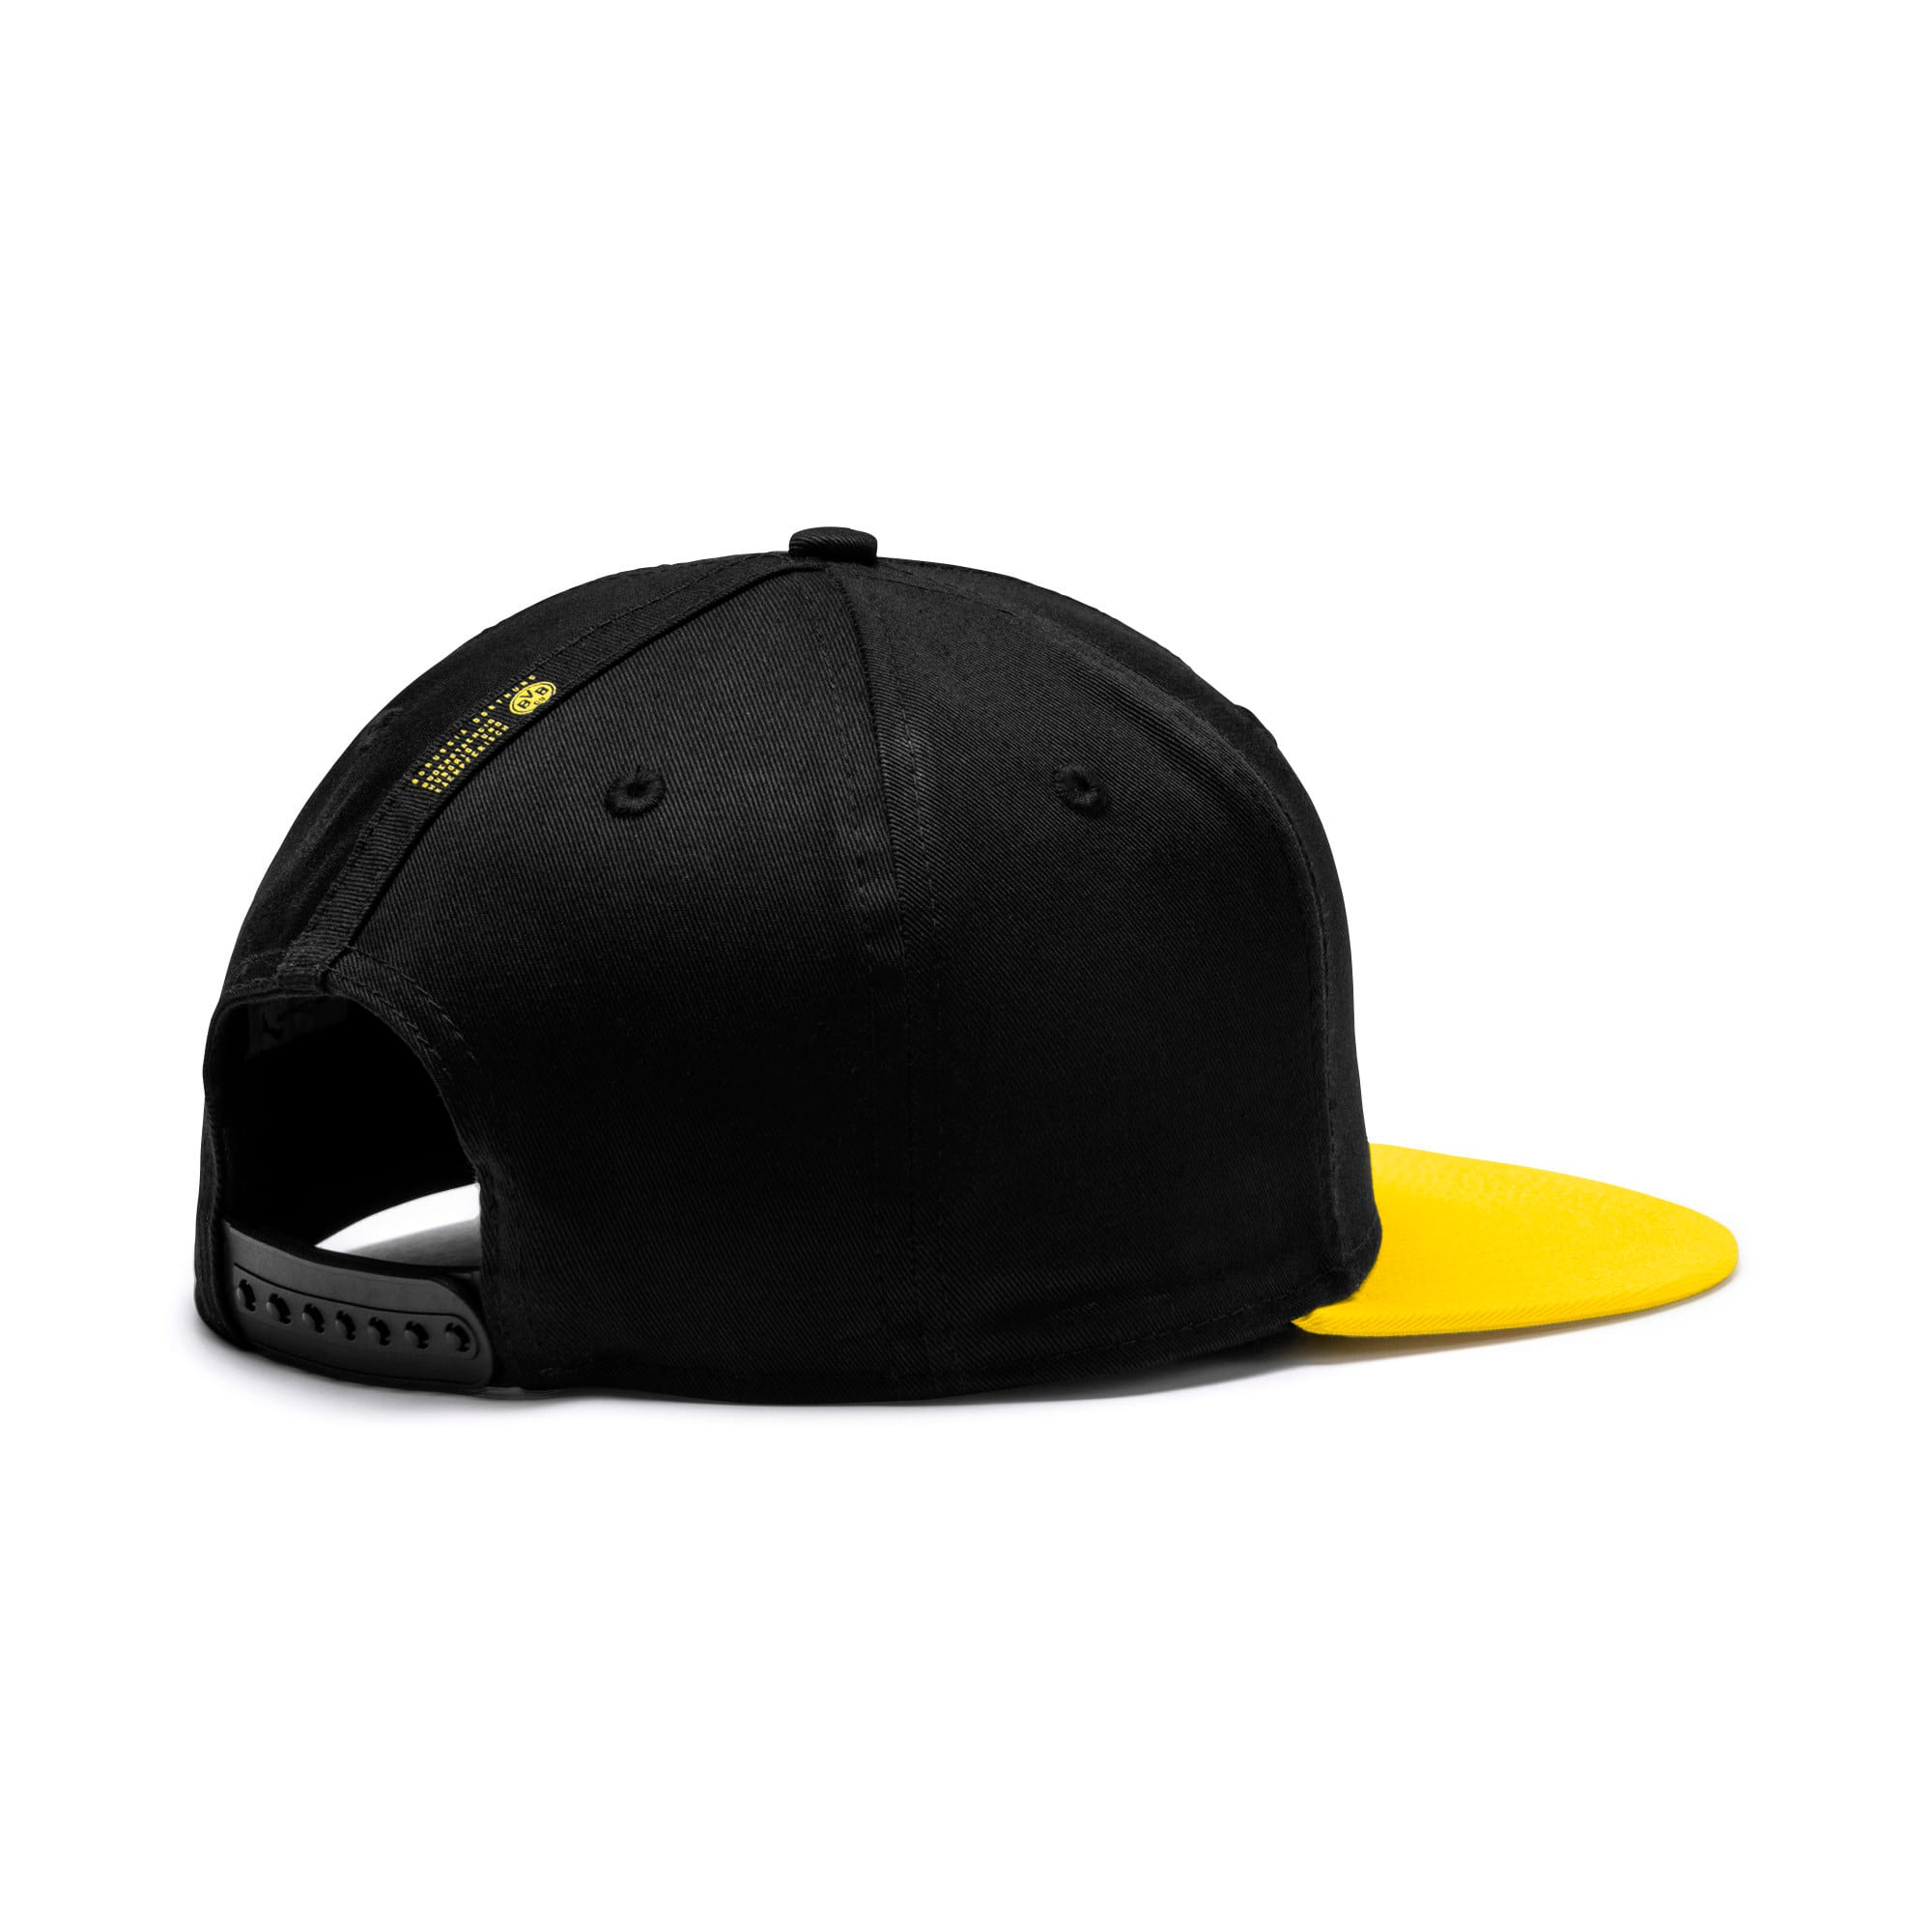 Thumbnail 2 of BVB flatbrim Fan Cap, Puma Black-Cyber Yellow, medium